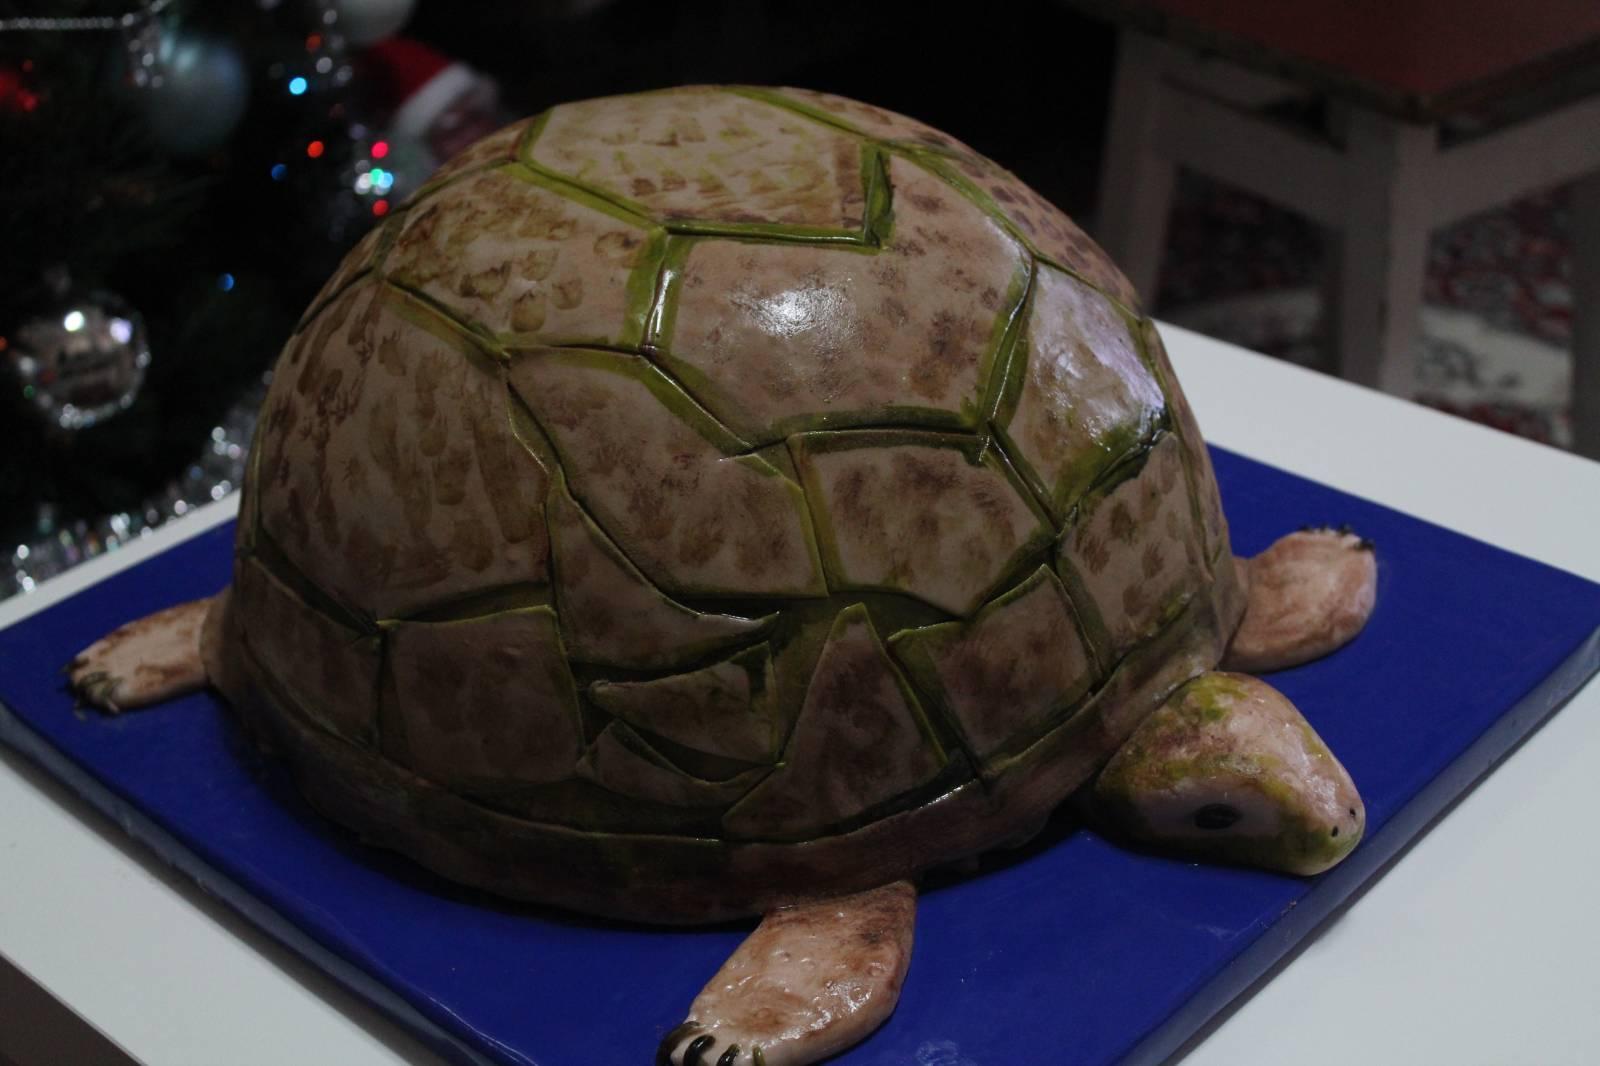 Рецепт торта черепаха в домашних условиях пошагово